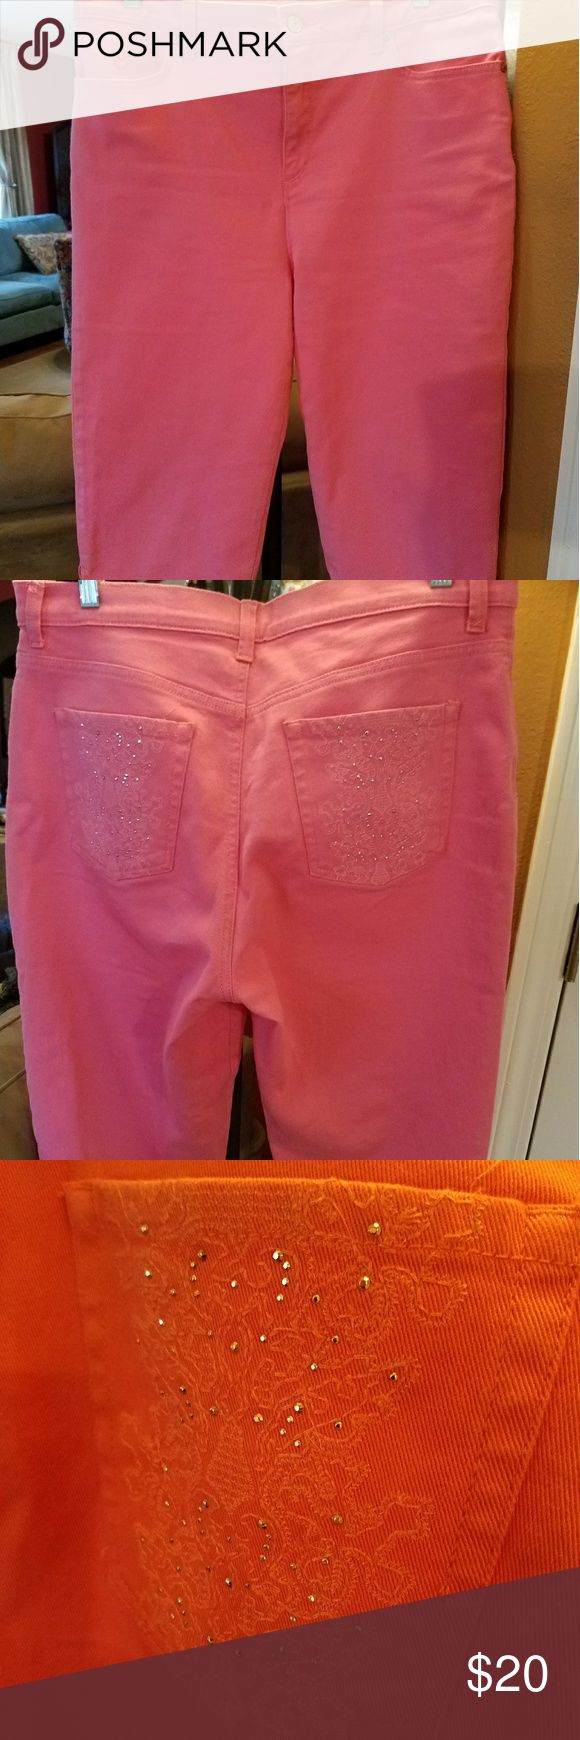 Pretty Pink Capris - 12P Cute pair of Pink Capris in slendering style with embellished pockets in back. Gloria Vanderbilt Pants Capris